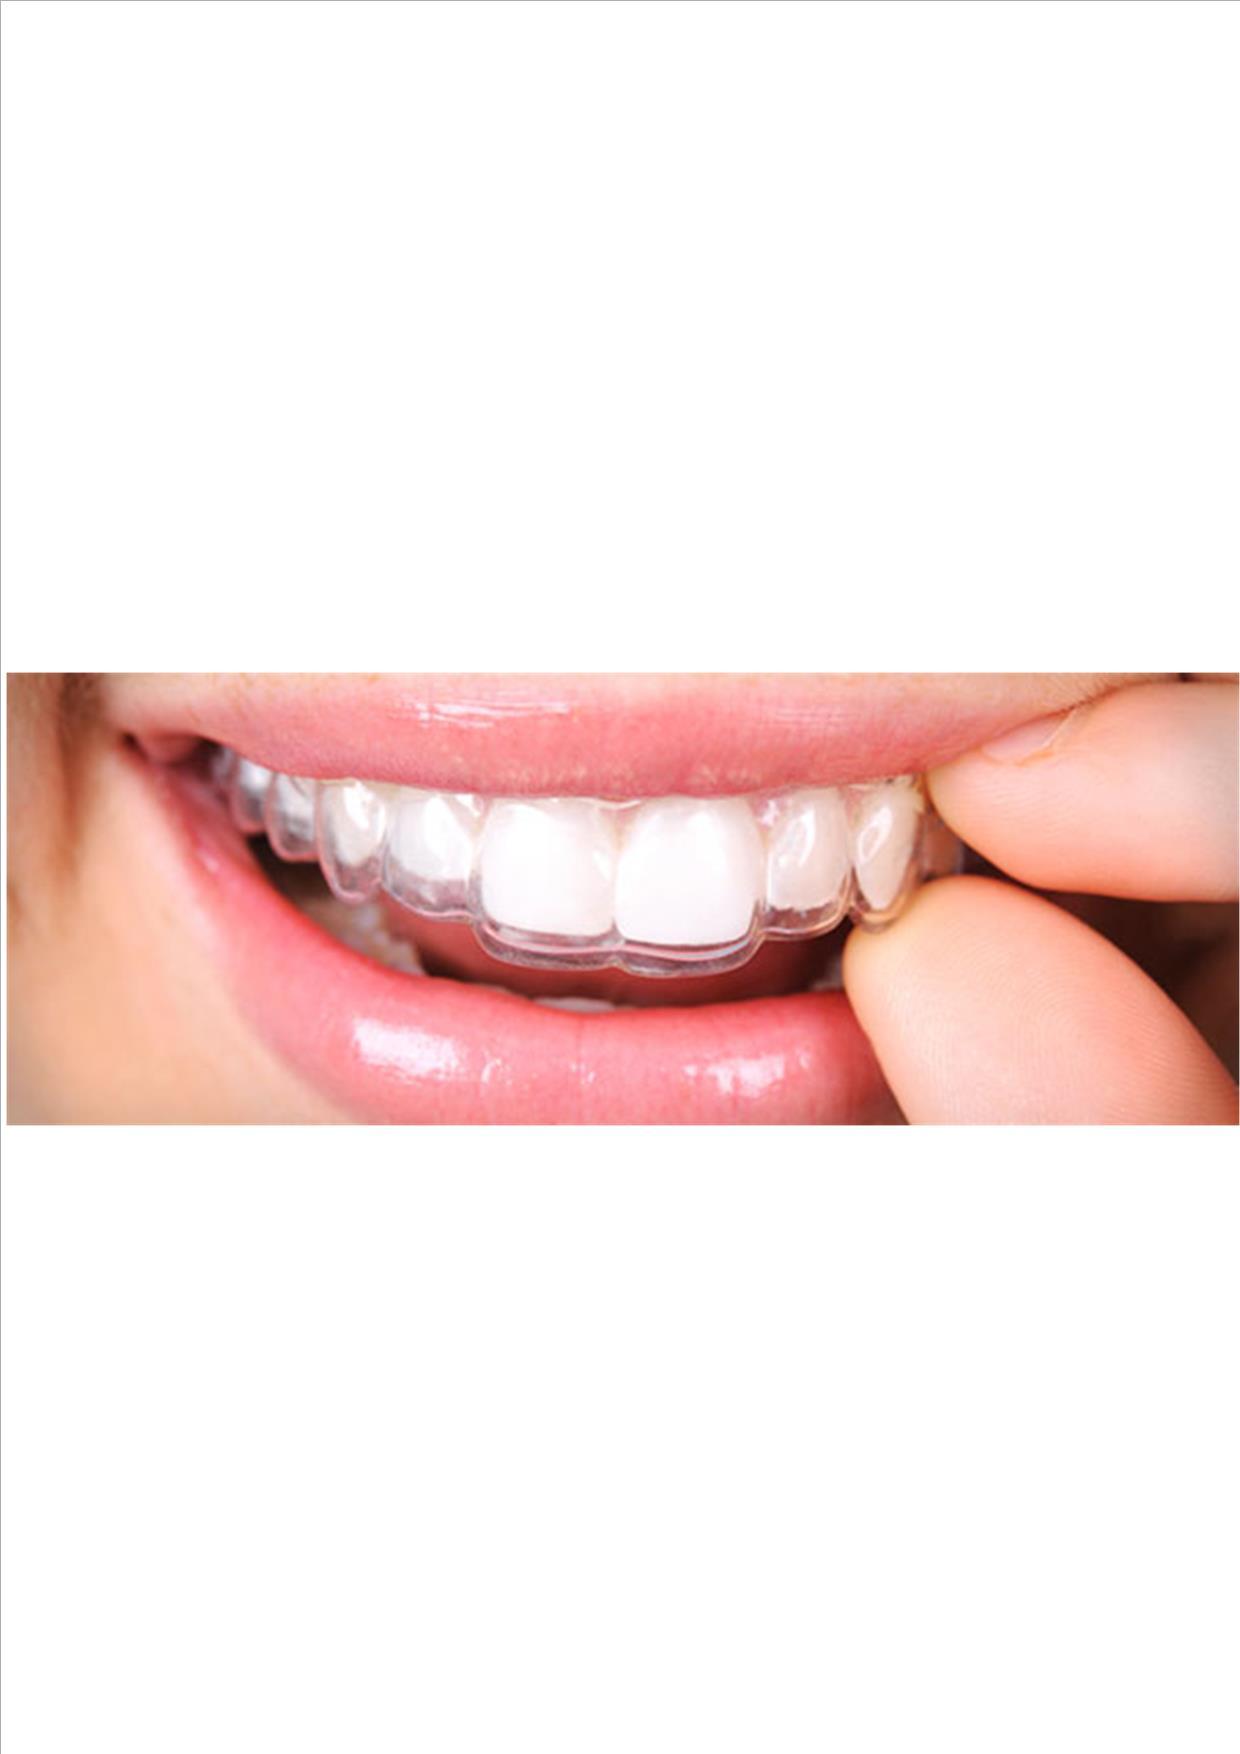 Orthotech (Orthodontics Appliances) LTD